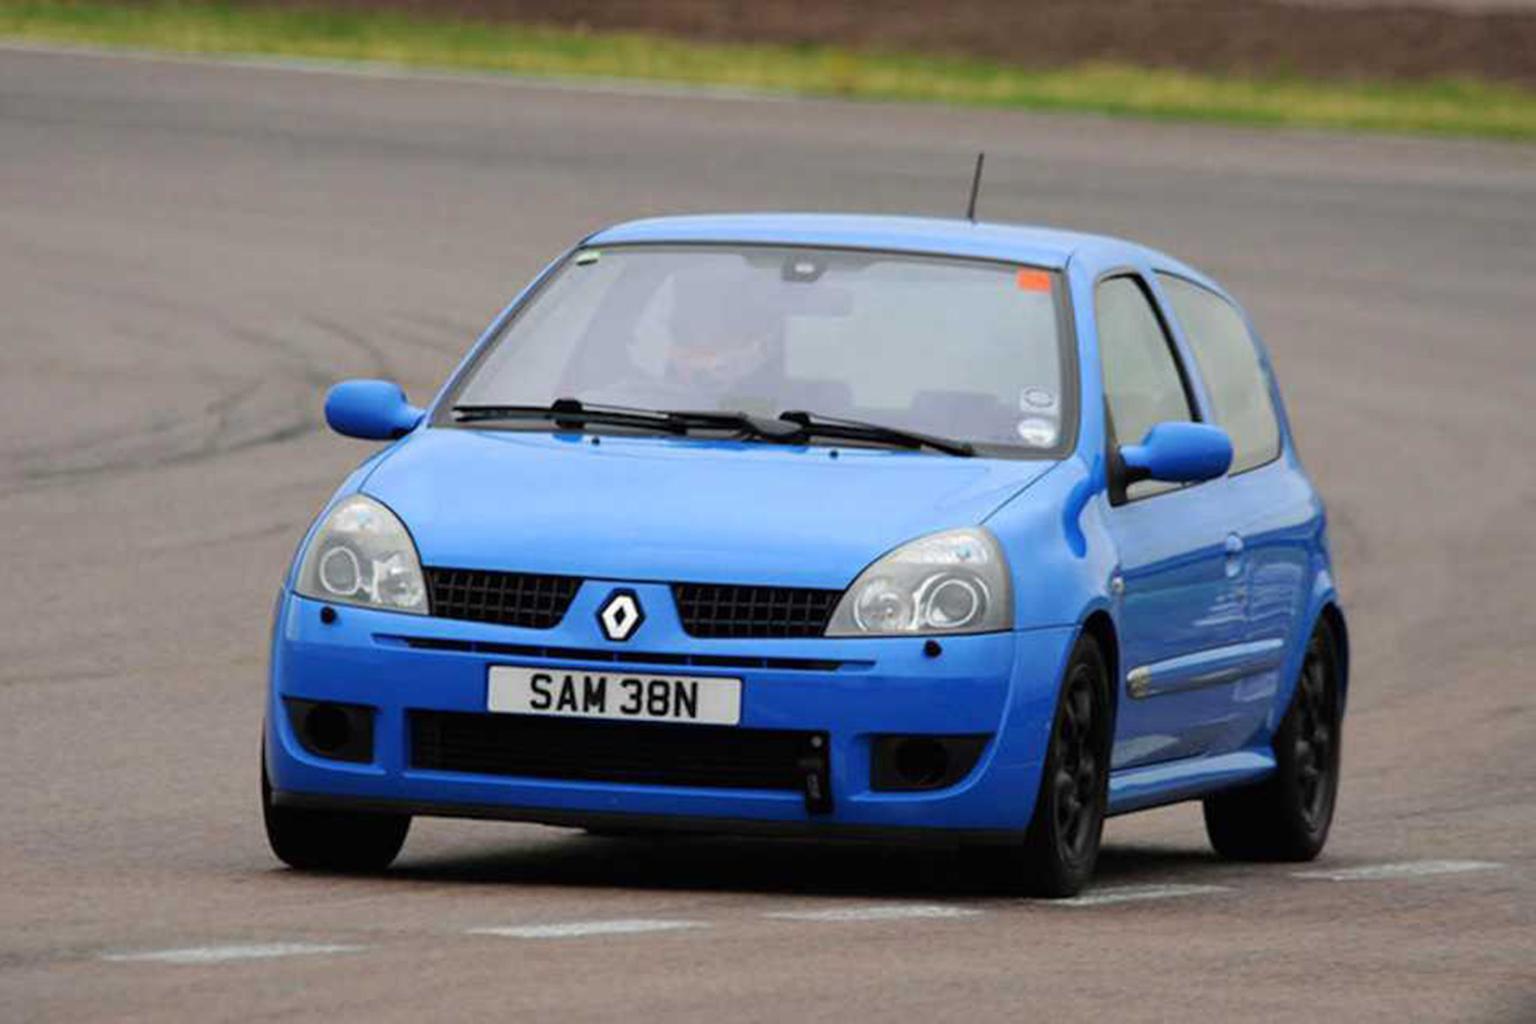 Renault Clio Renaultsport